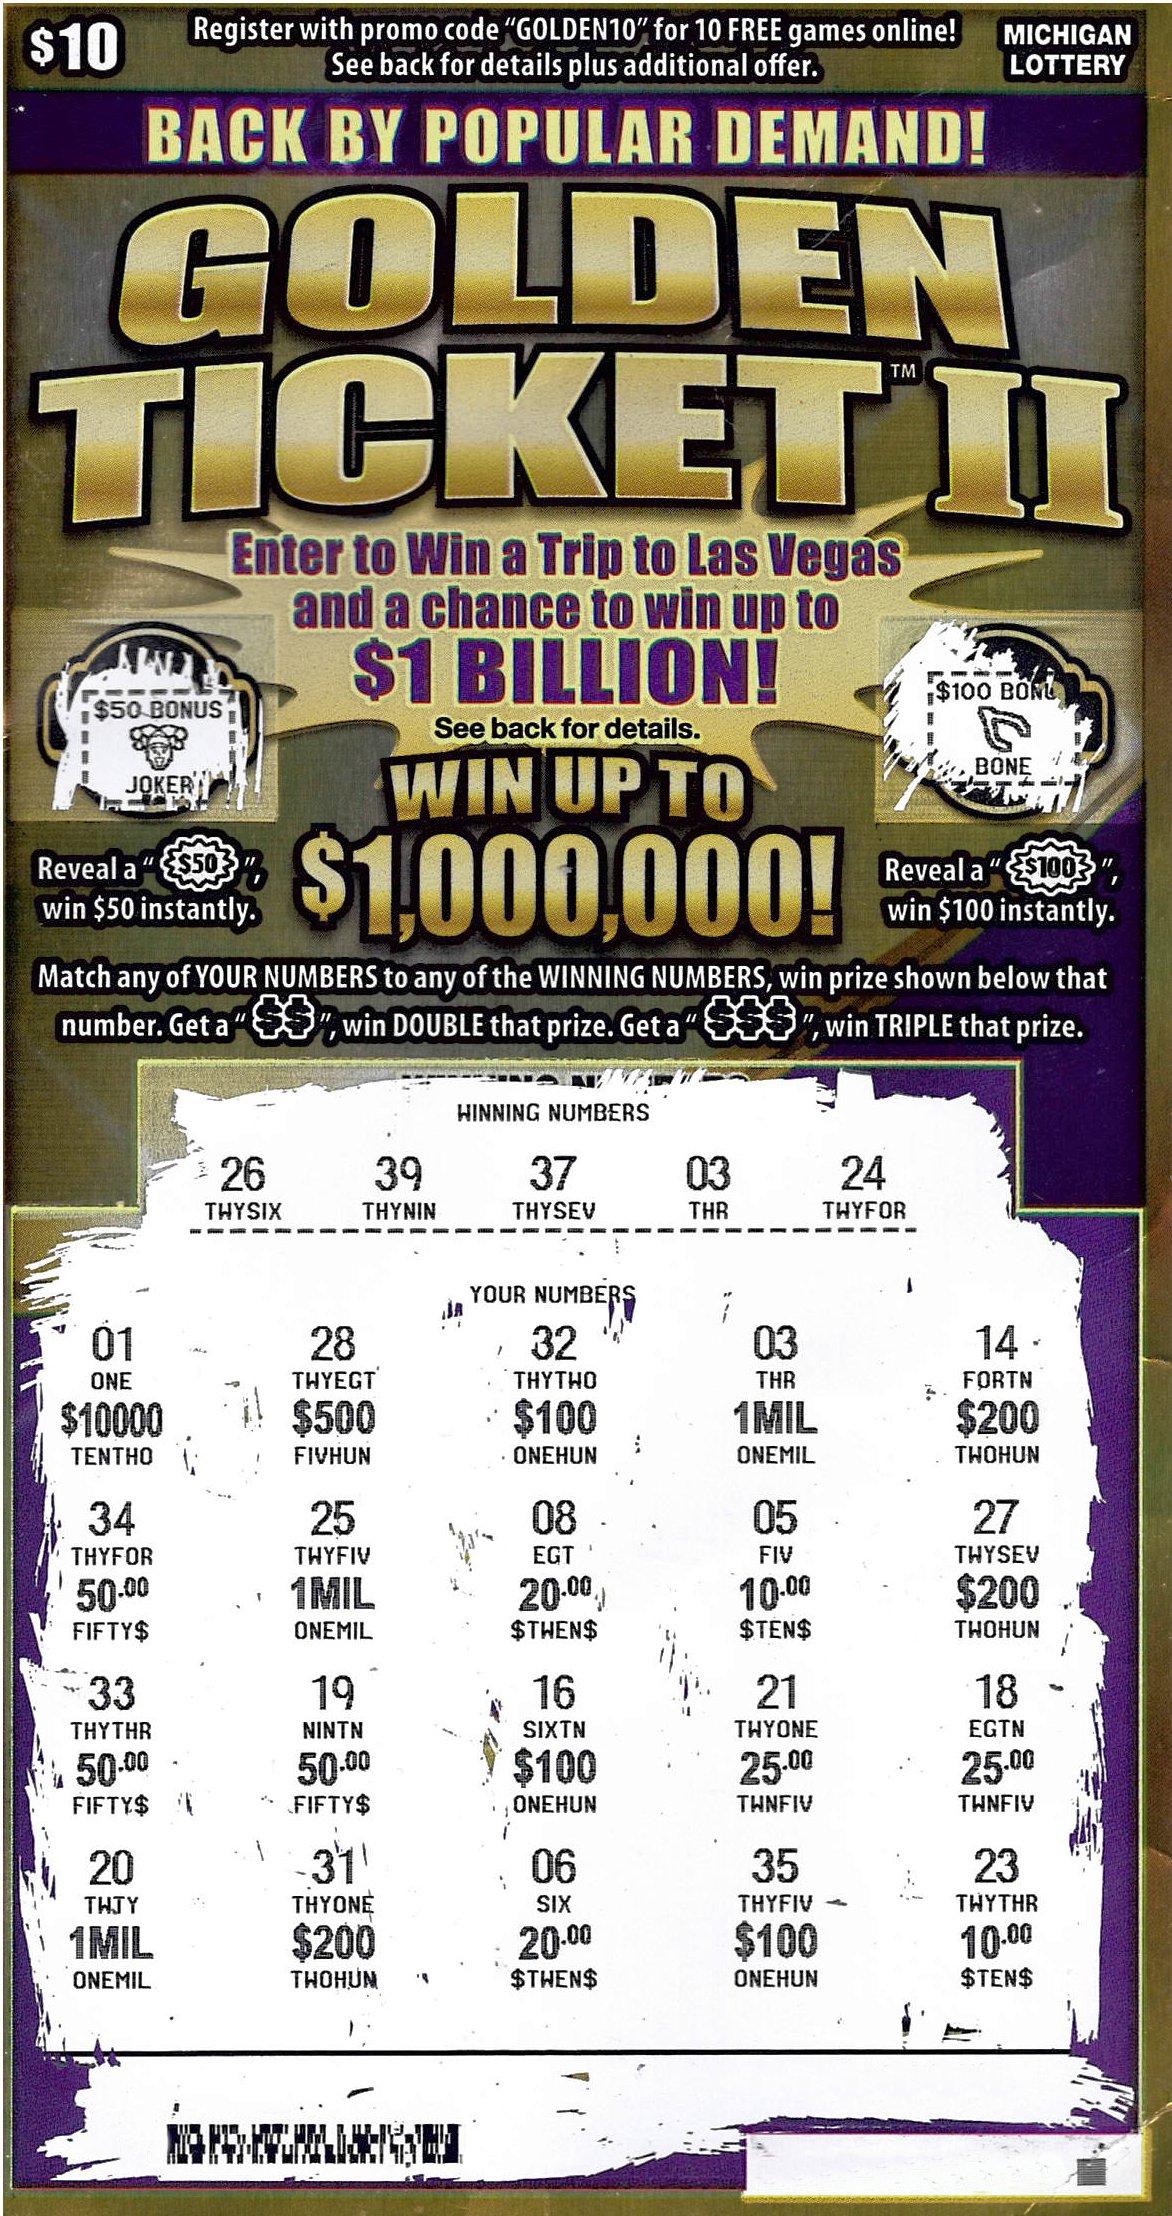 Lansing Man Wins $1 Million Playing the Michigan Lottery's